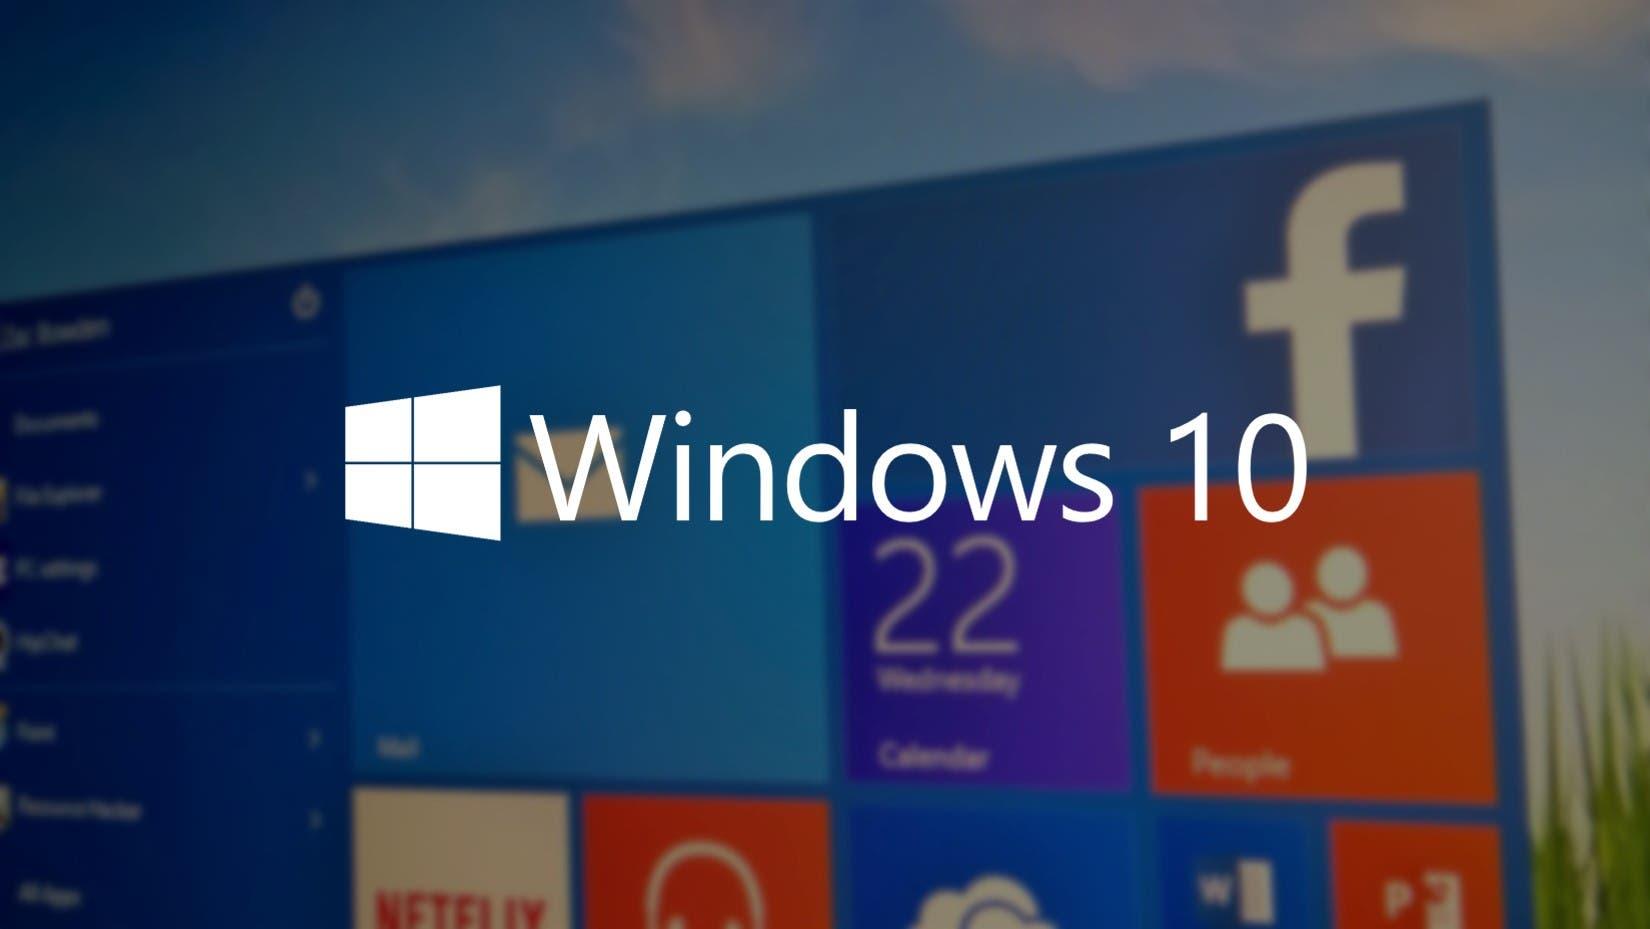 Windows 10 News Thumb